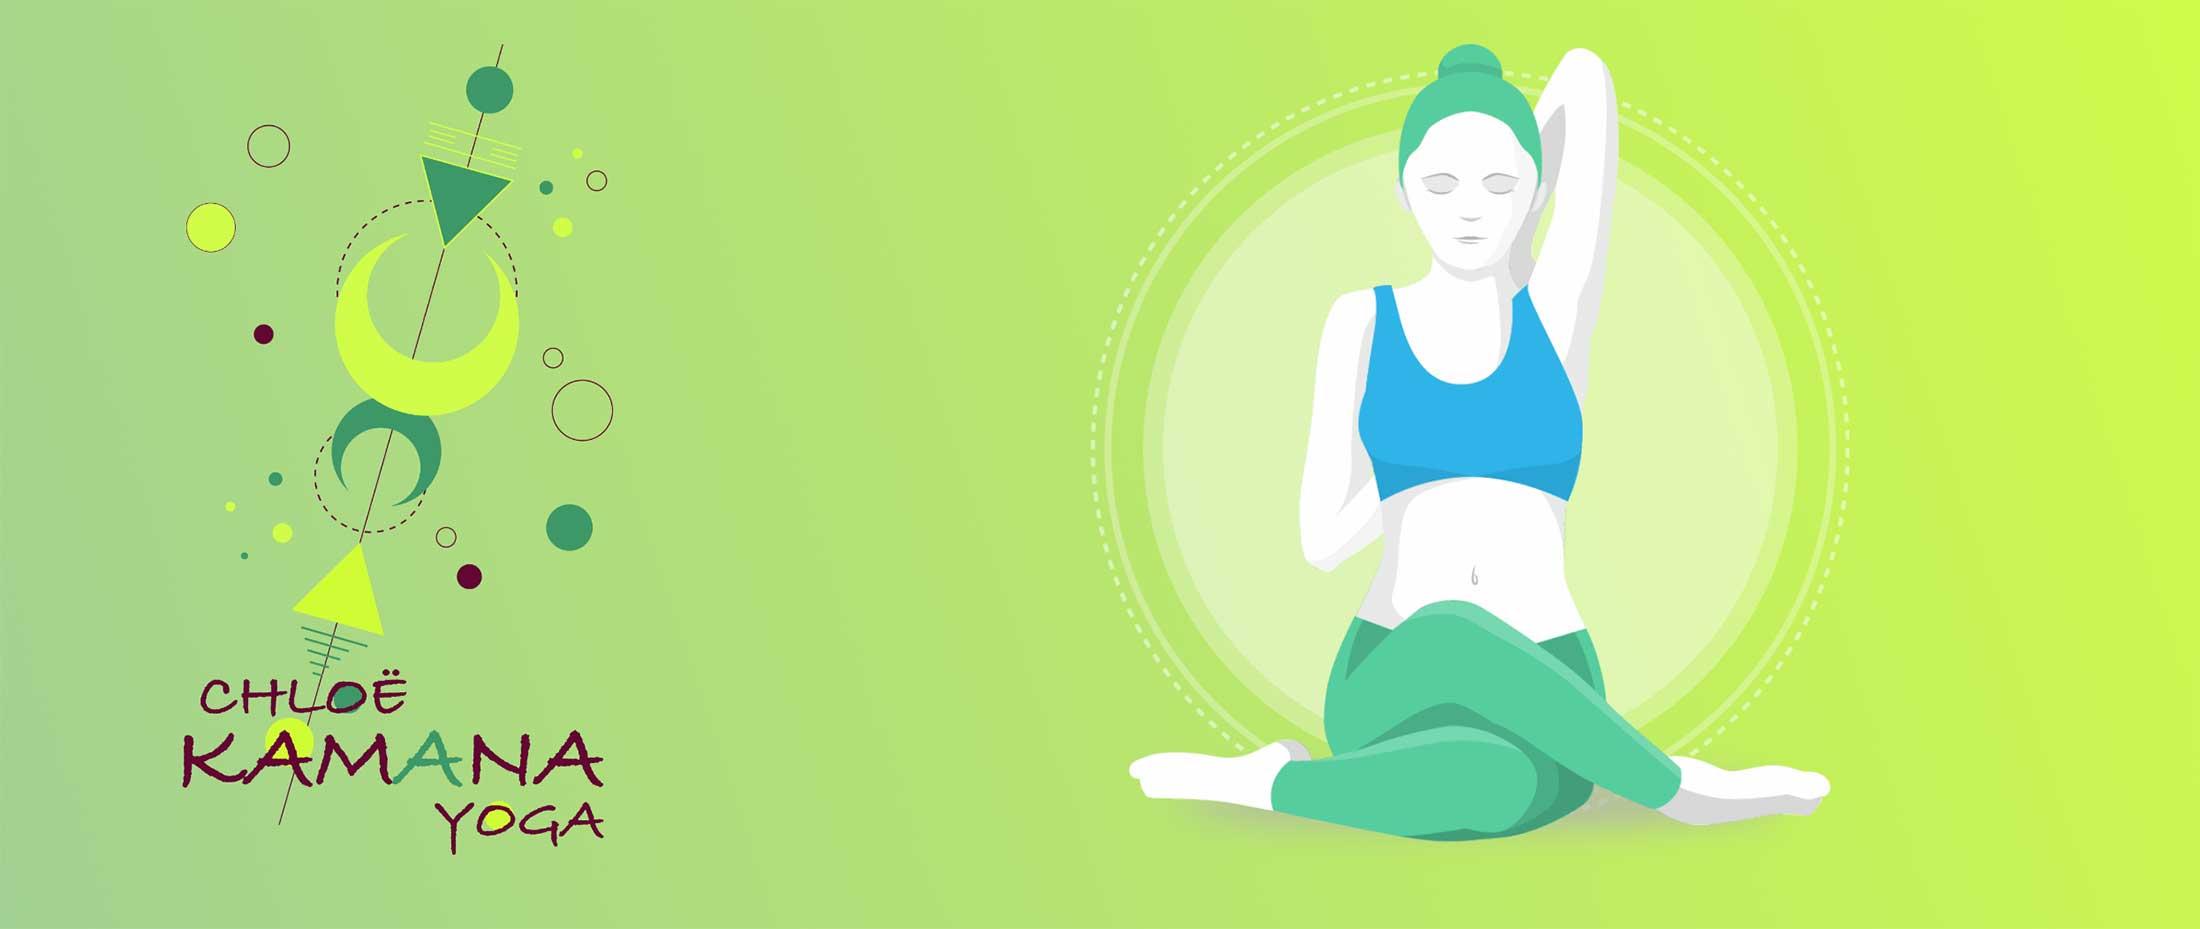 kamanayoga Yoga & massage yoga thai